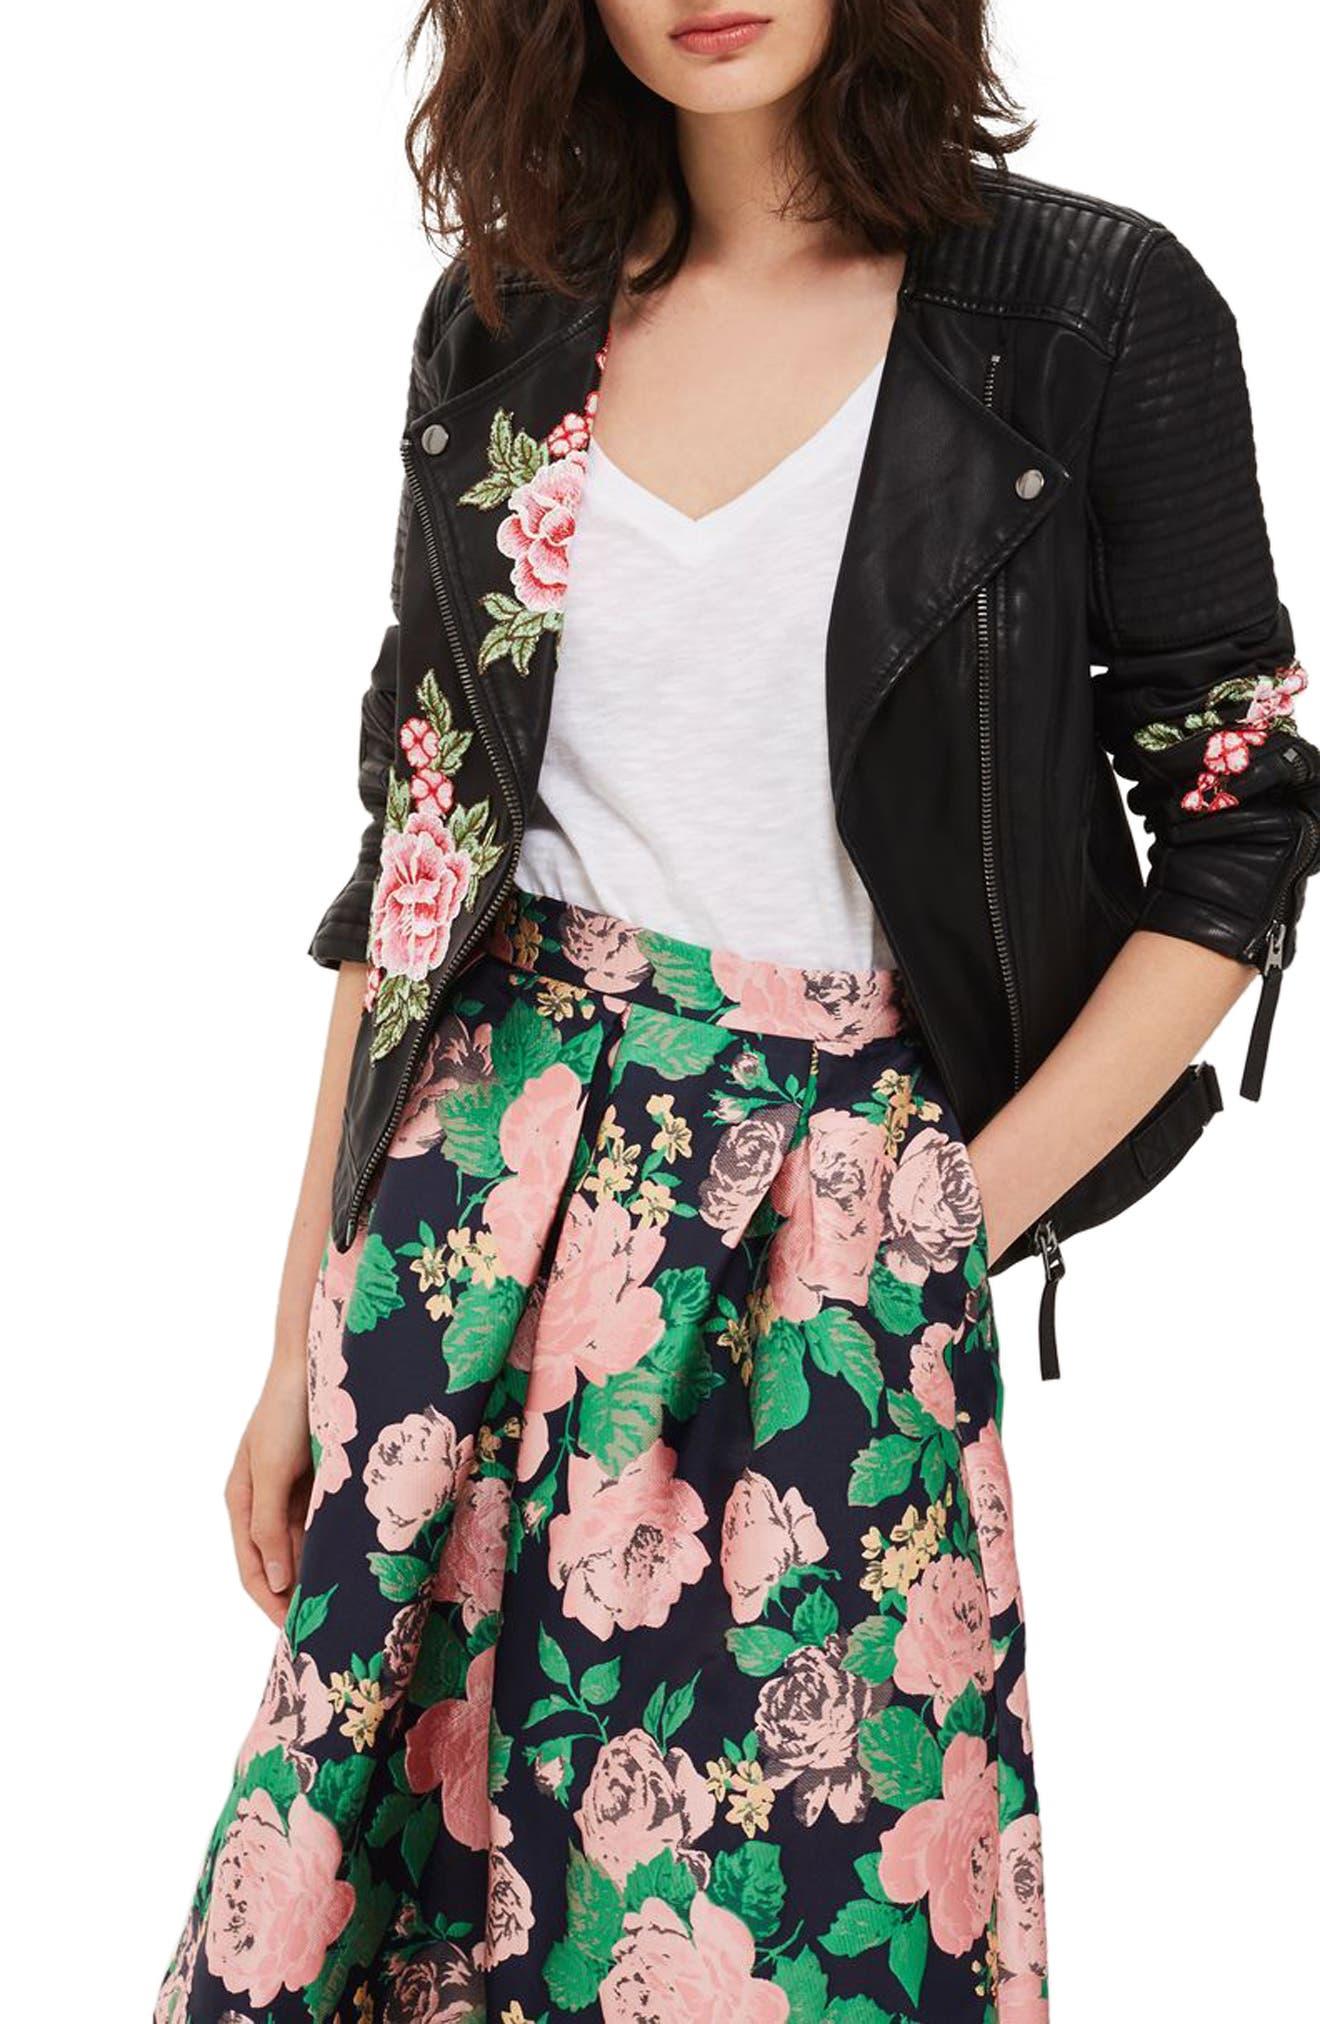 Alternate Image 1 Selected - Topshop Luna Floral Patch Faux Leather Biker Jacket